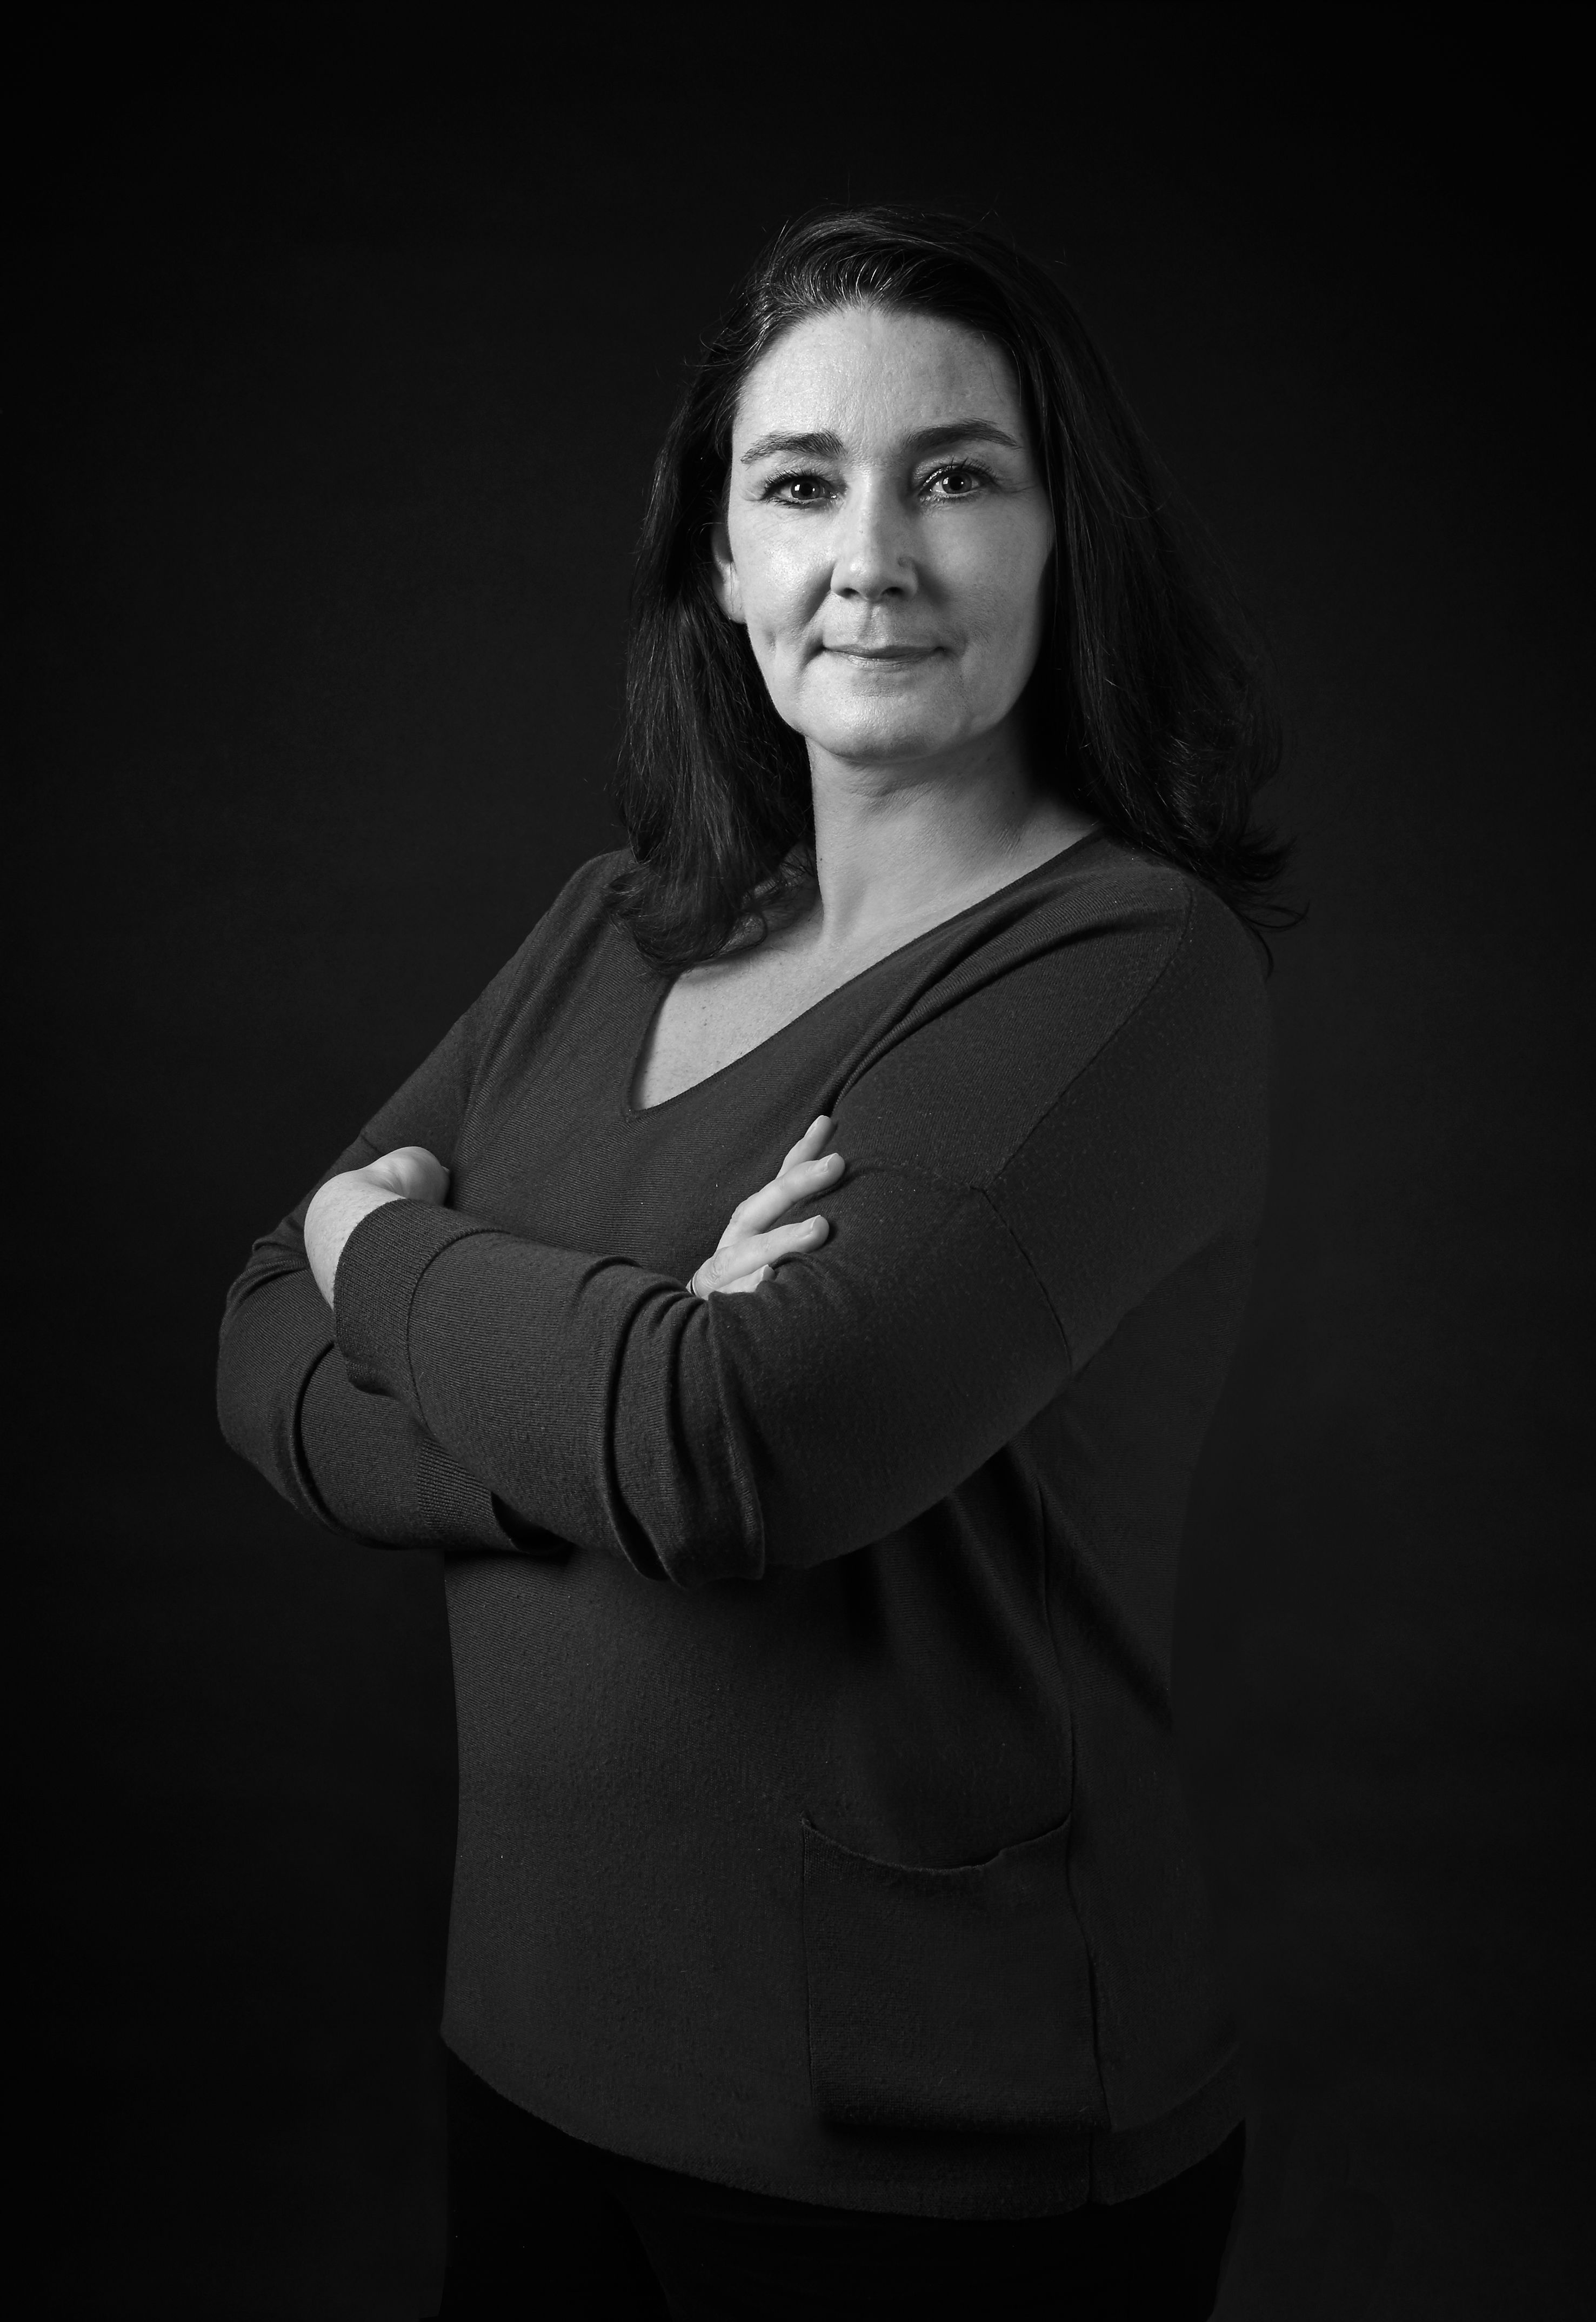 Isabelle Penaud